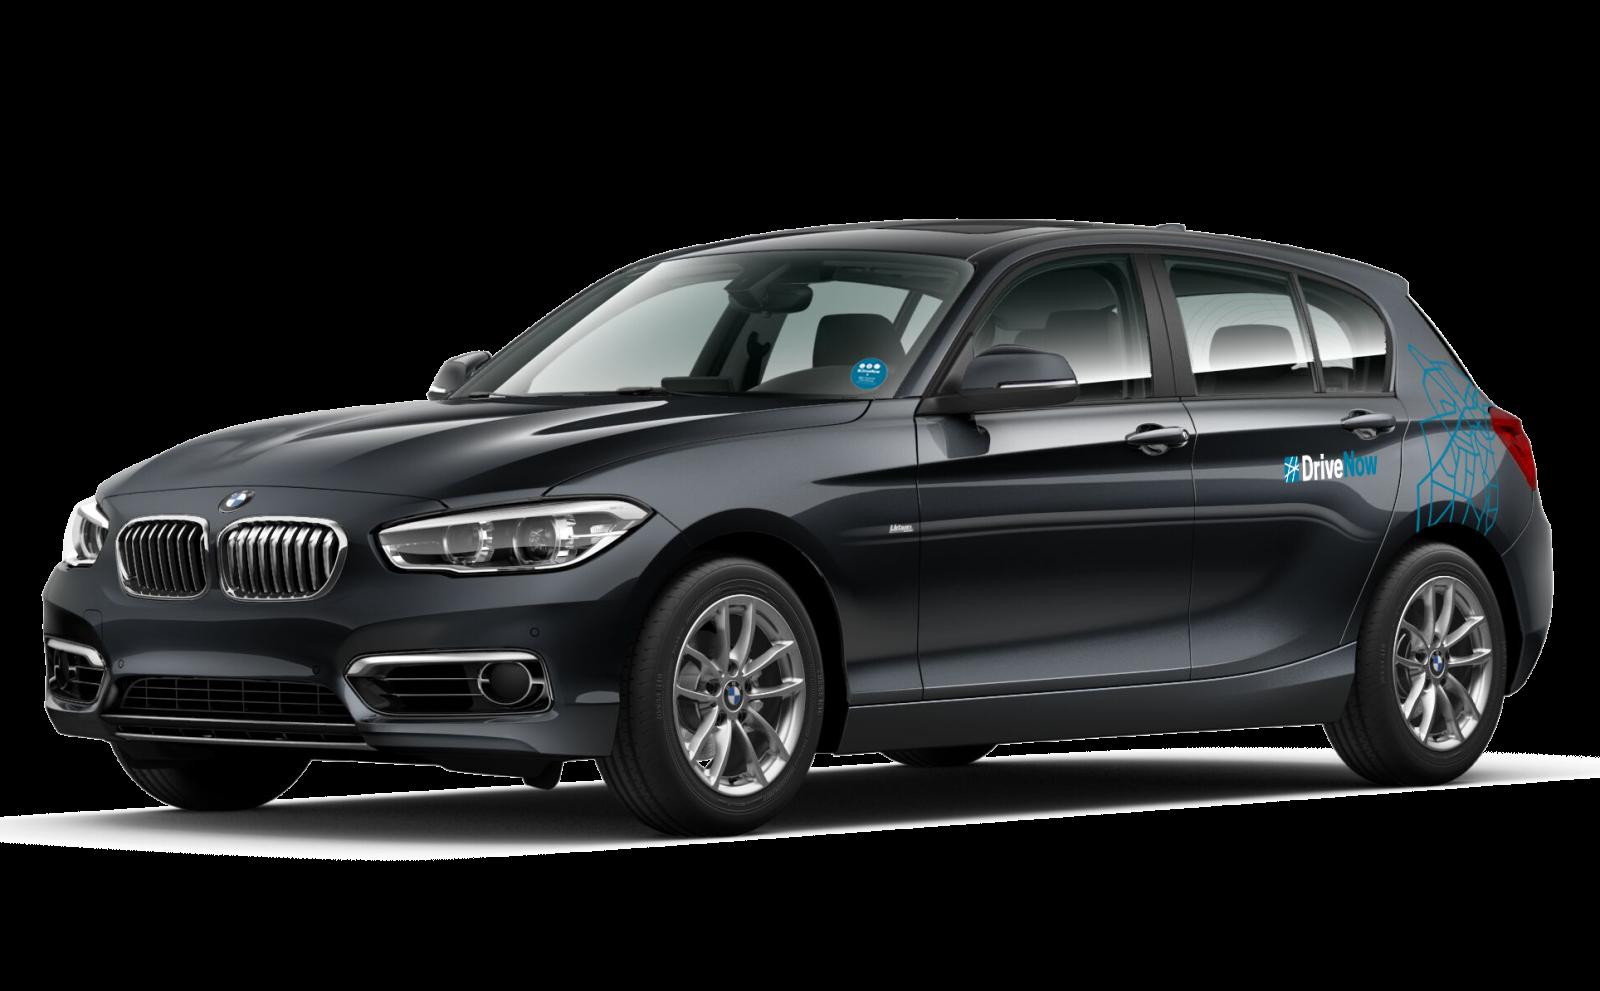 DriveNow_BMW_1SeriesLCI_Silhouette_Transvers_MineralGrey (2)_10_2